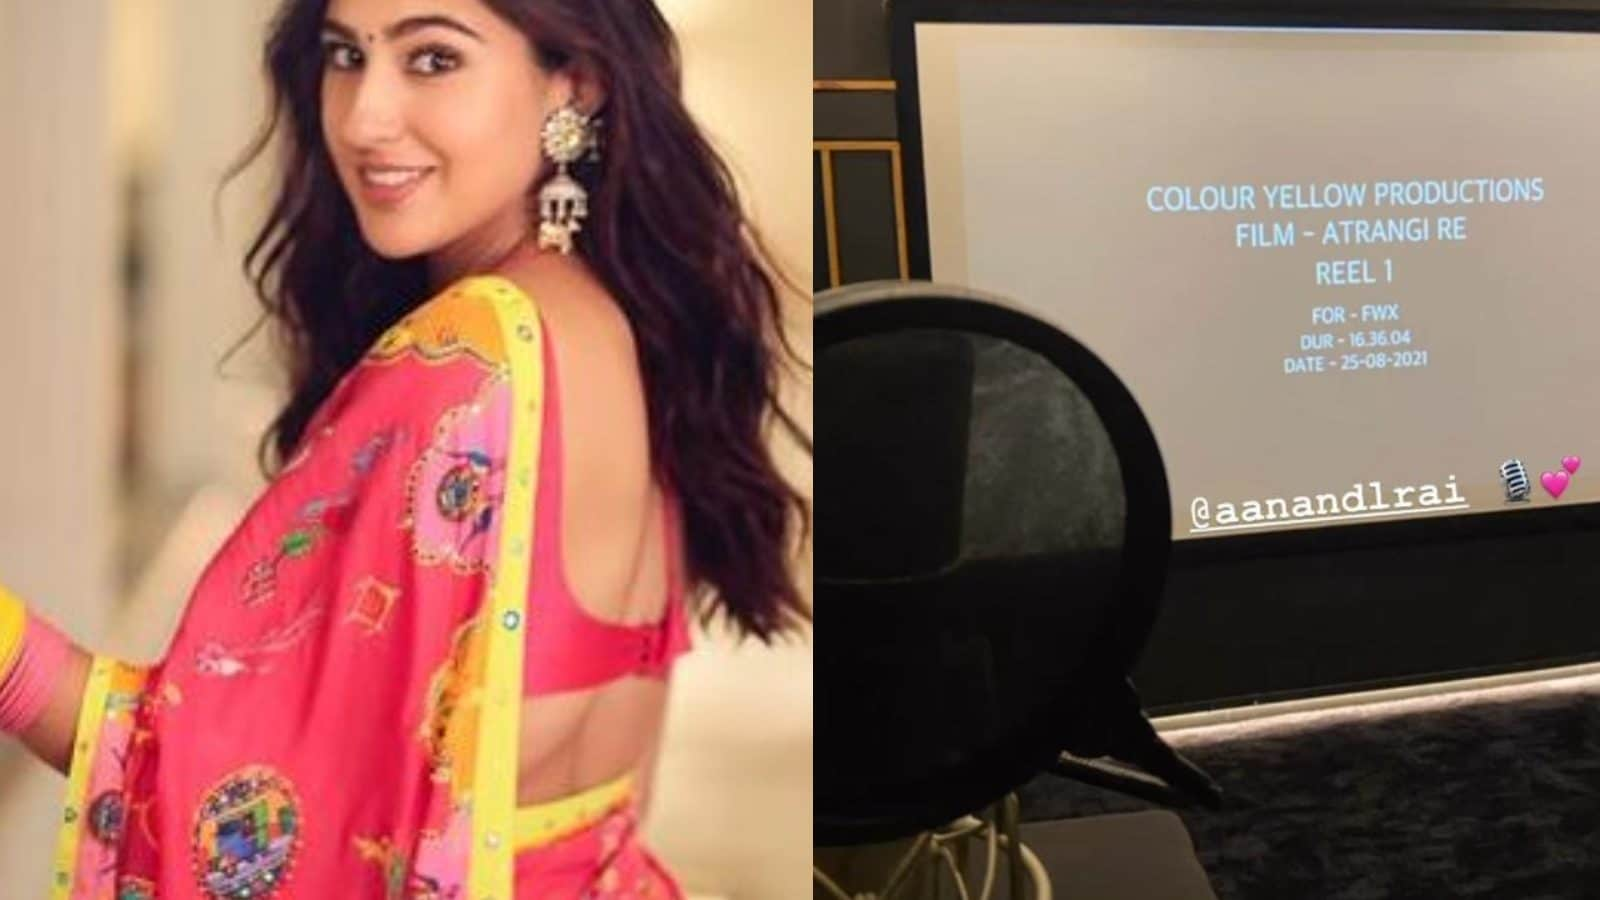 Sara Ali Khan Dubs For Atrangi Re While Akshay Kumar Hints at Film's OTT Release